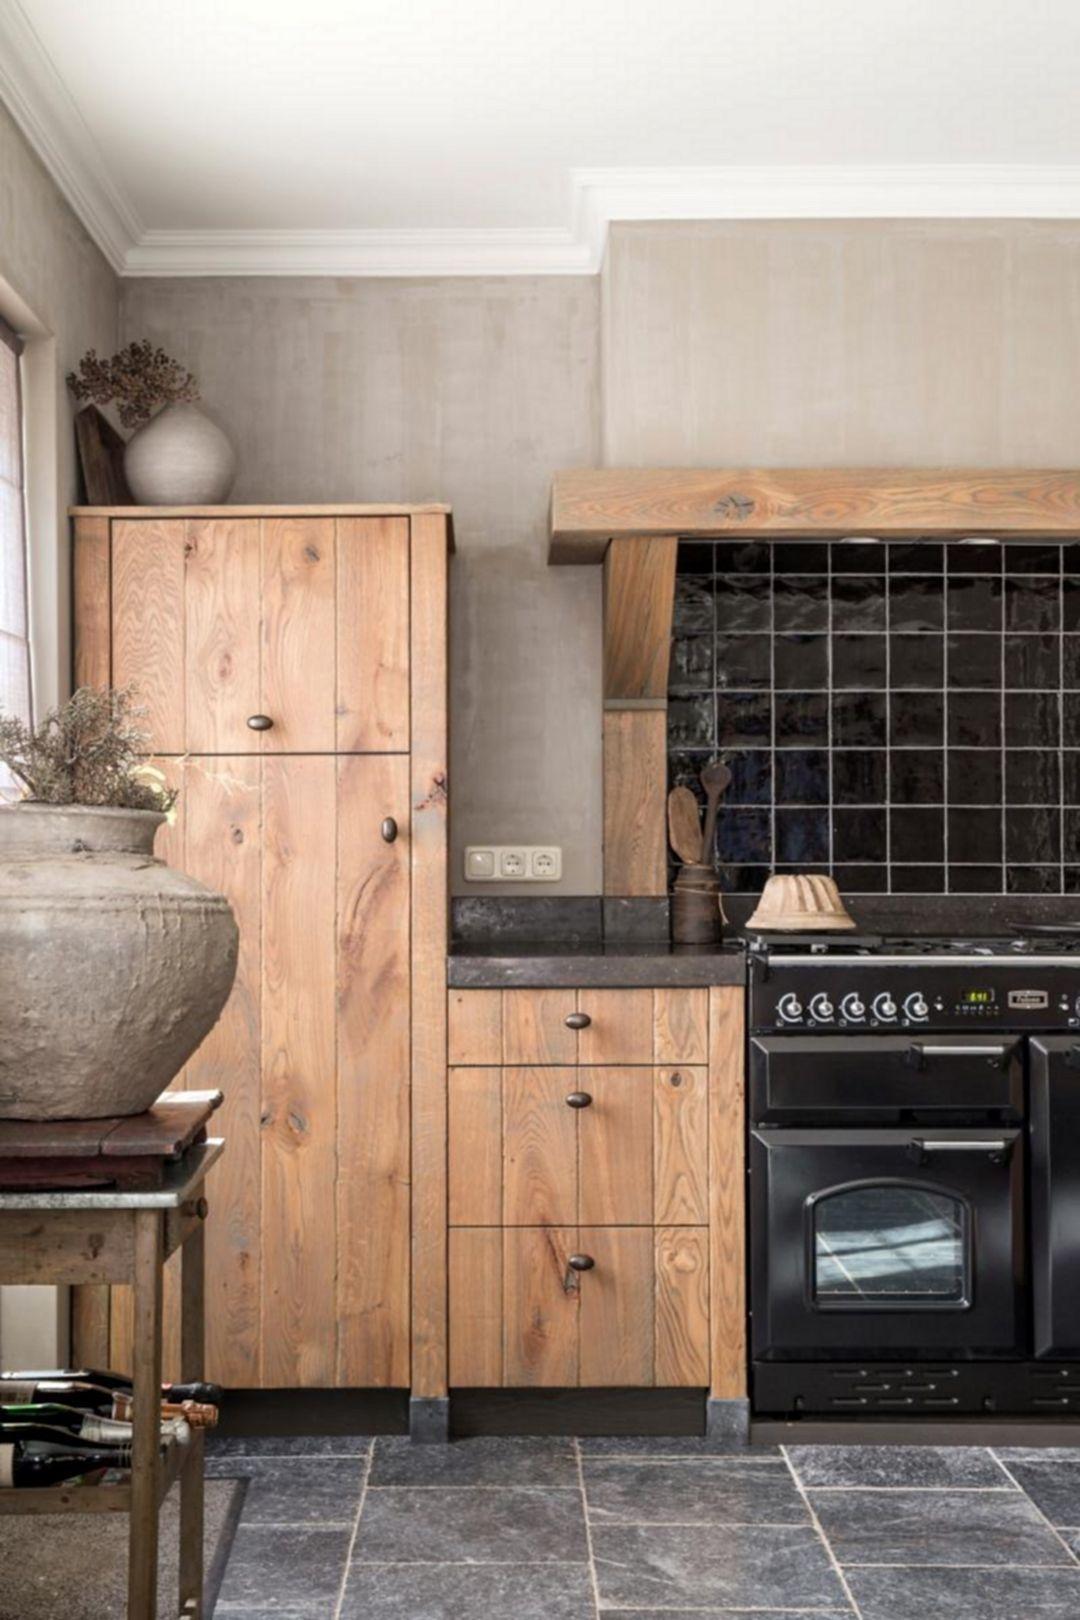 Beautiful Wooden Kitchen Cupboards Design Ideas For Comfortable Cool Kitchen Cupboards Designs Pictures Design Inspiration